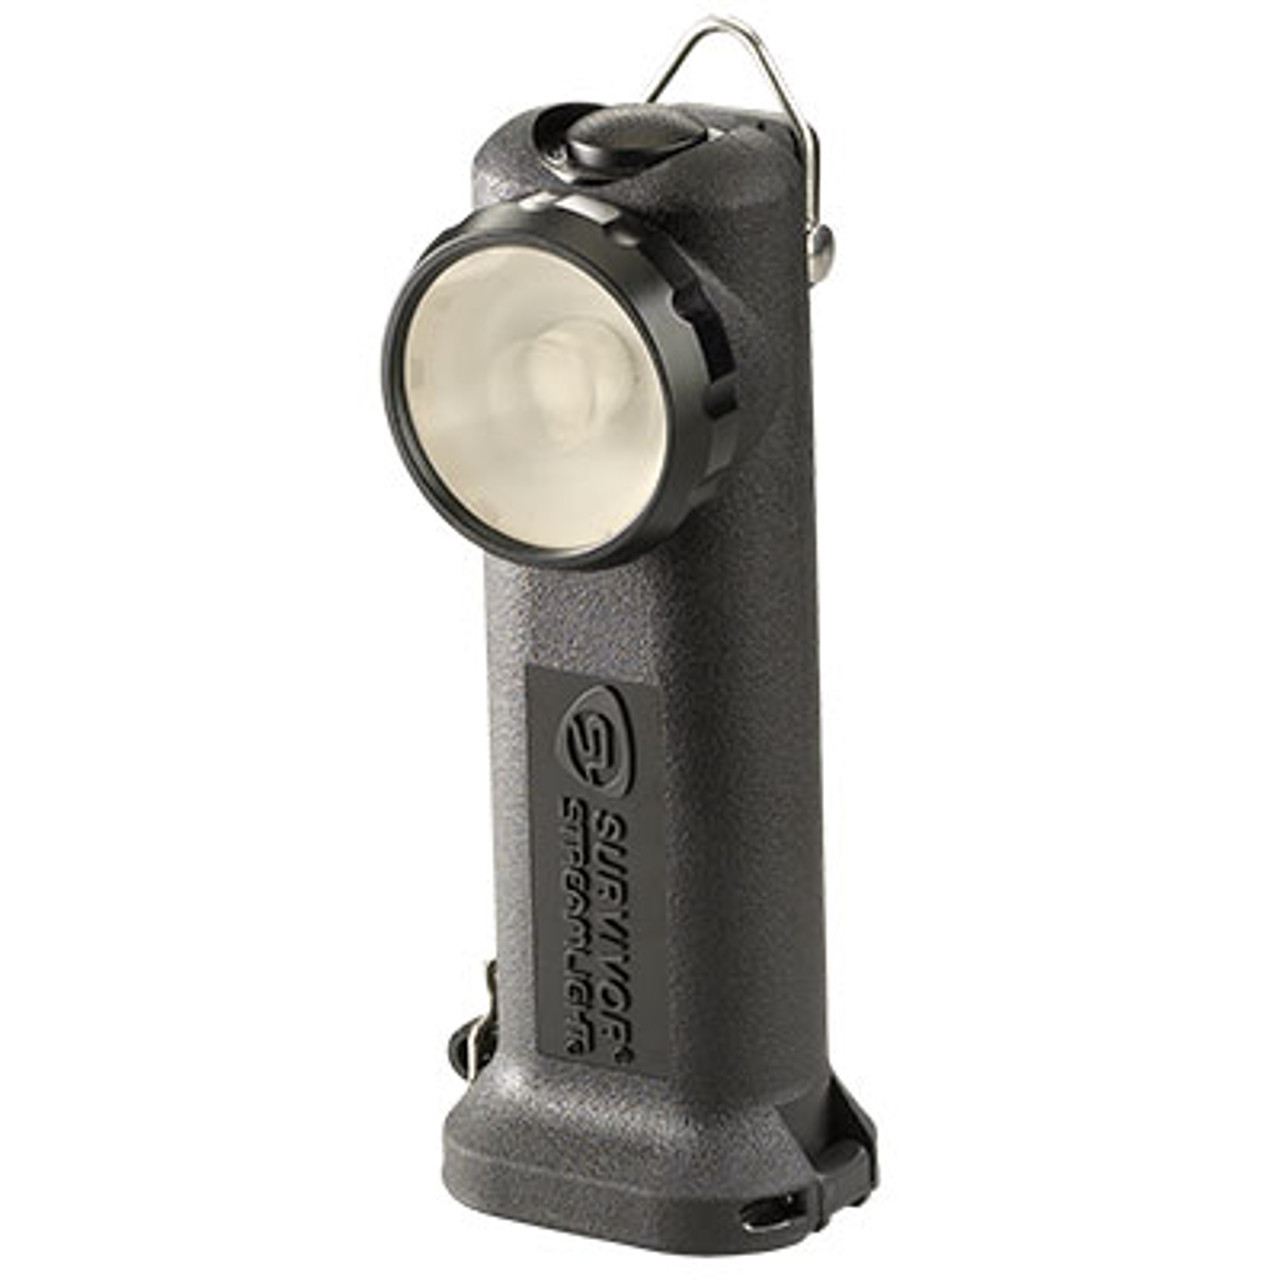 Streamlight Survivor LED Alkaline Model